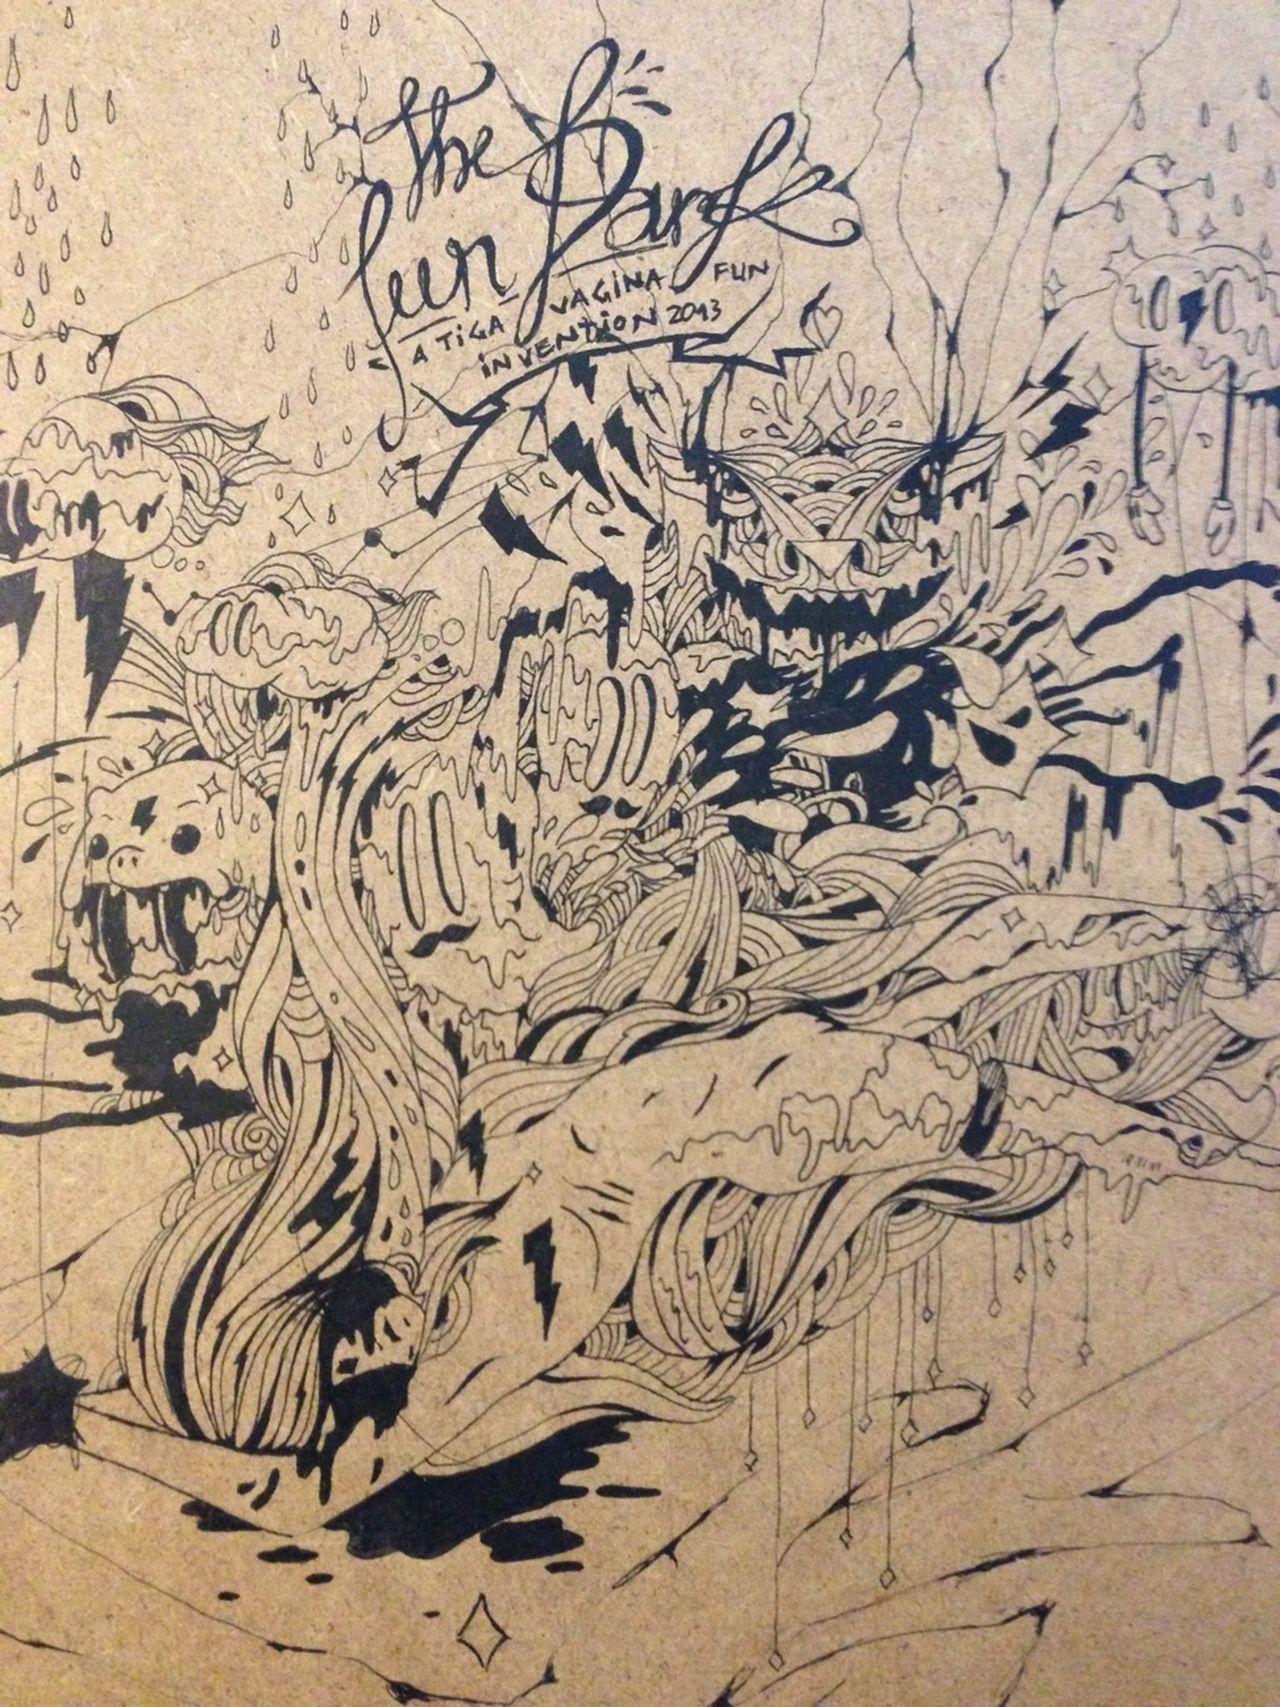 Illustrating